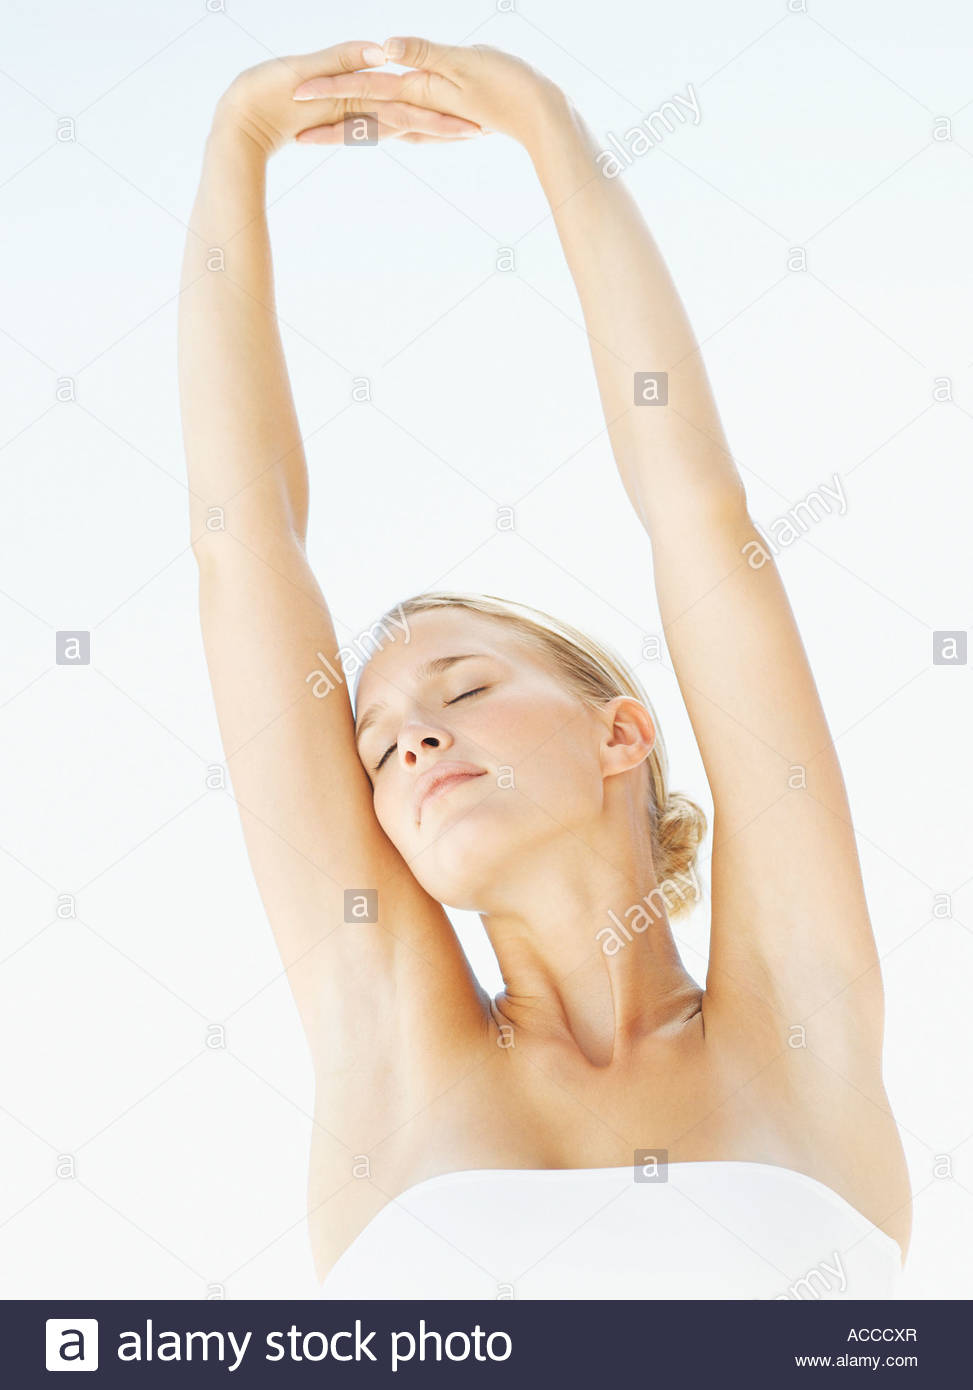 Woman stretching arms upward - Stock Image